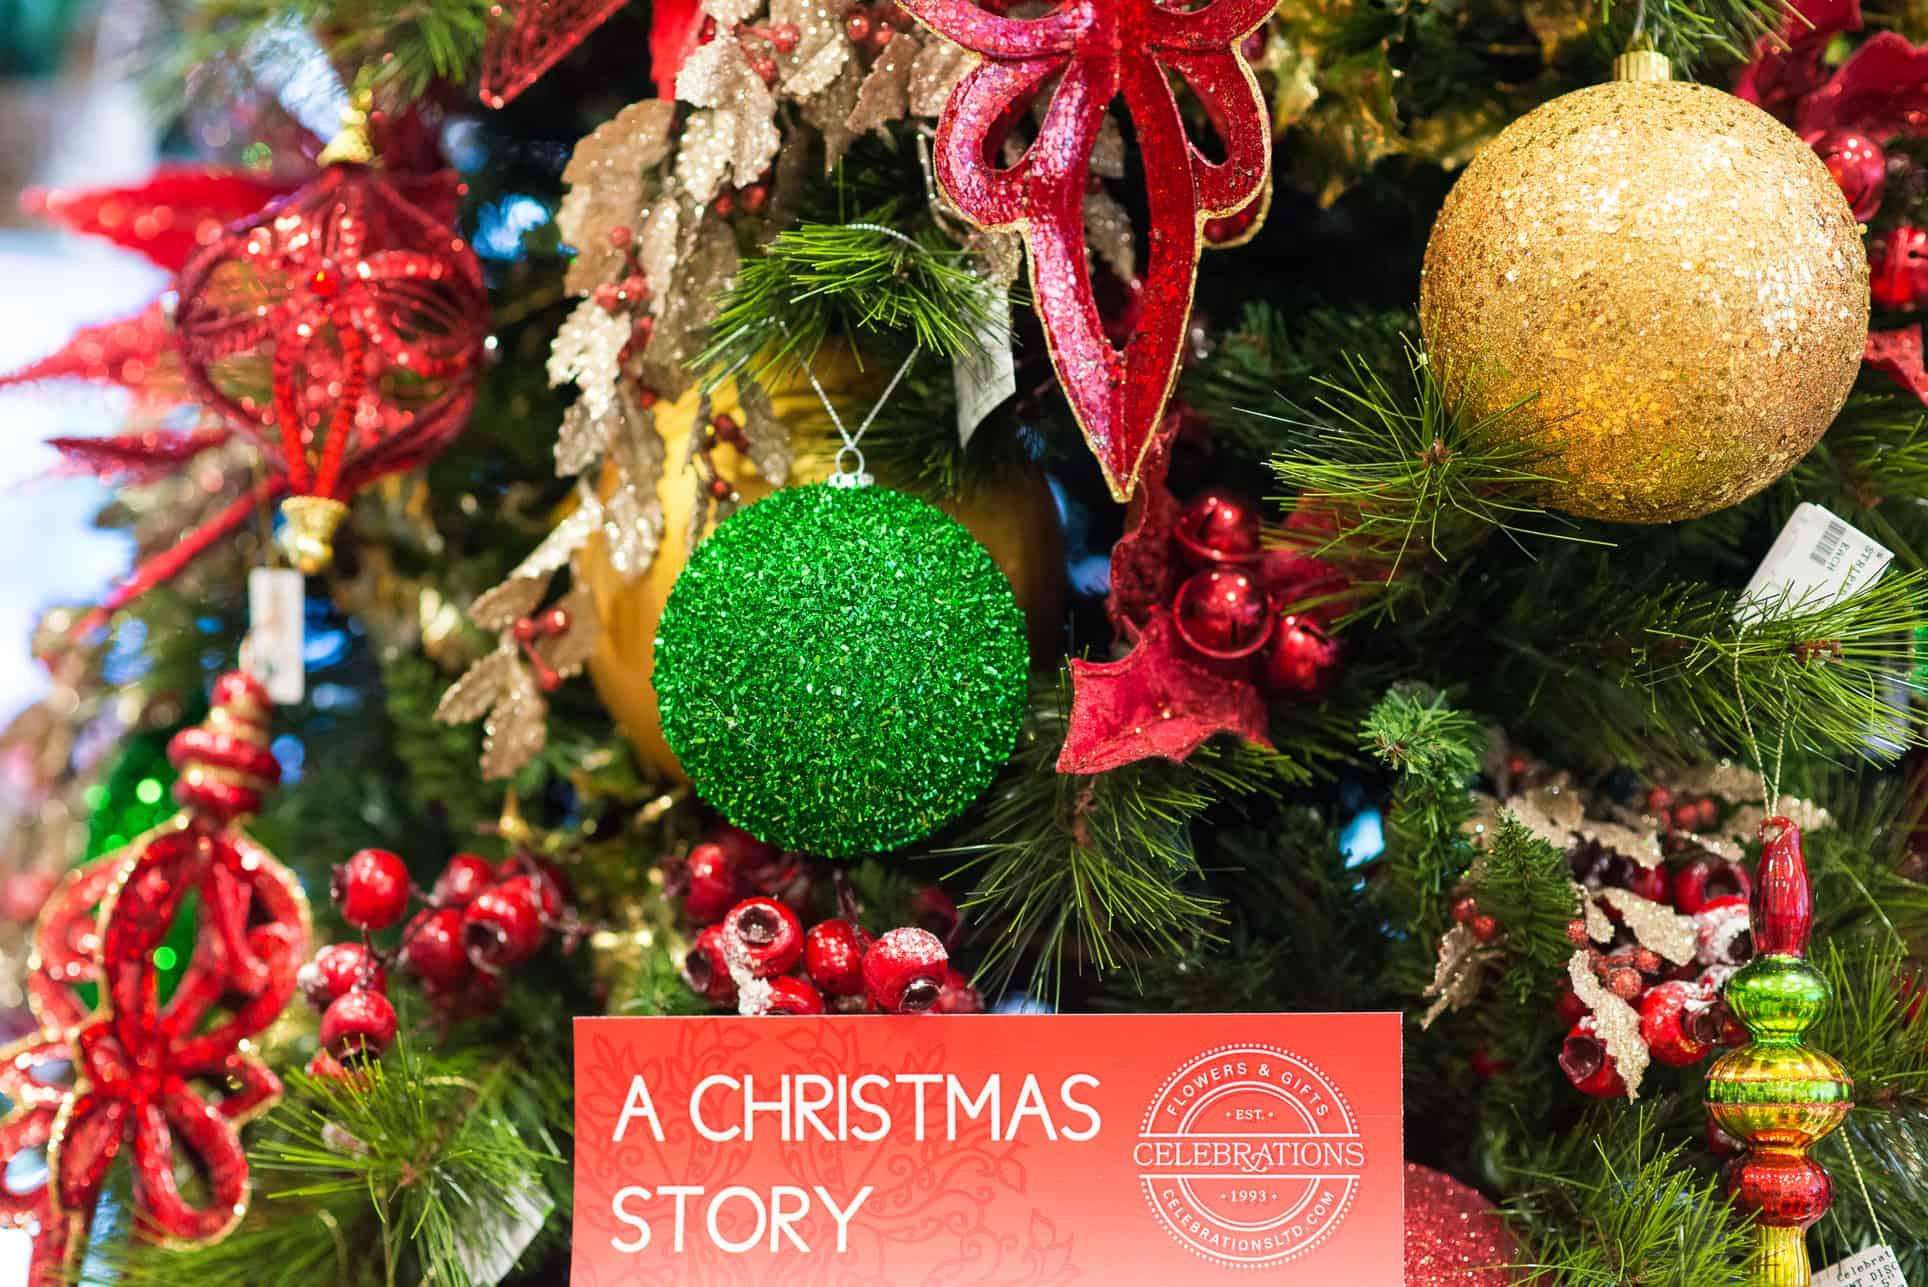 TRIM-A-TREE WORKSHOP ON DECEMBER 1ST – IT\'S A DATE! - Celebrations ...